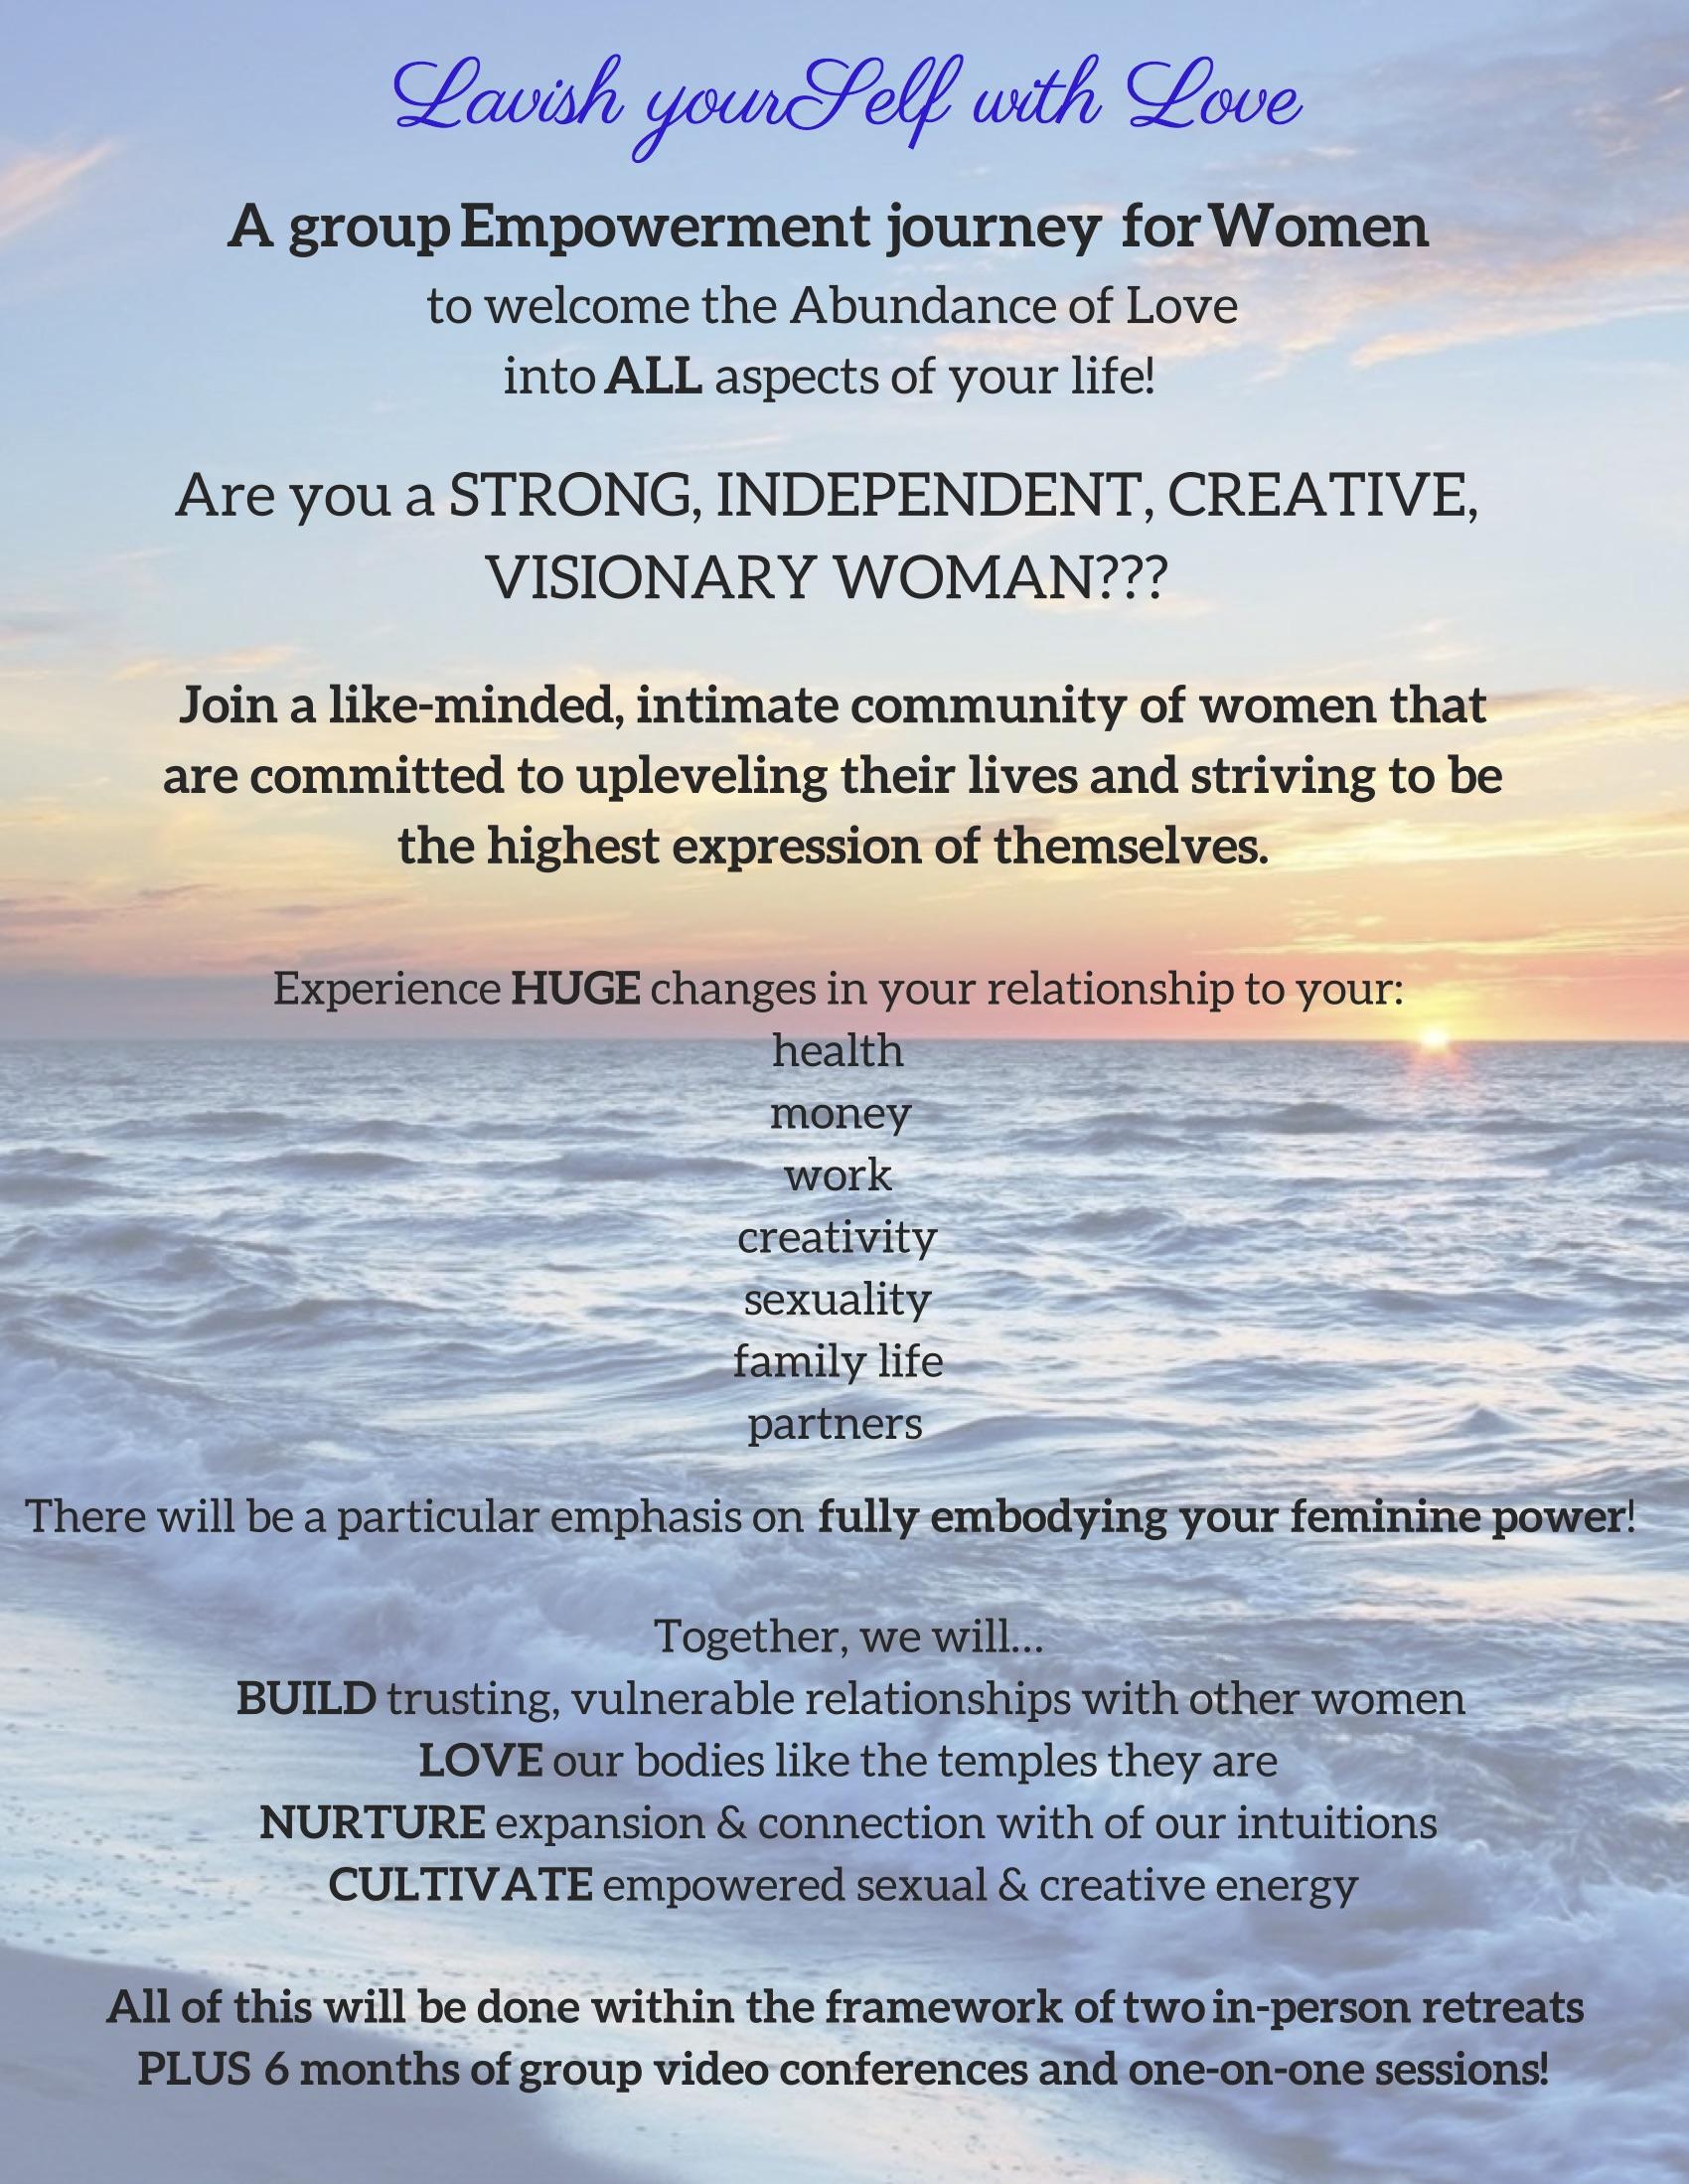 Lavish yourSelf with Love -website1.jpg